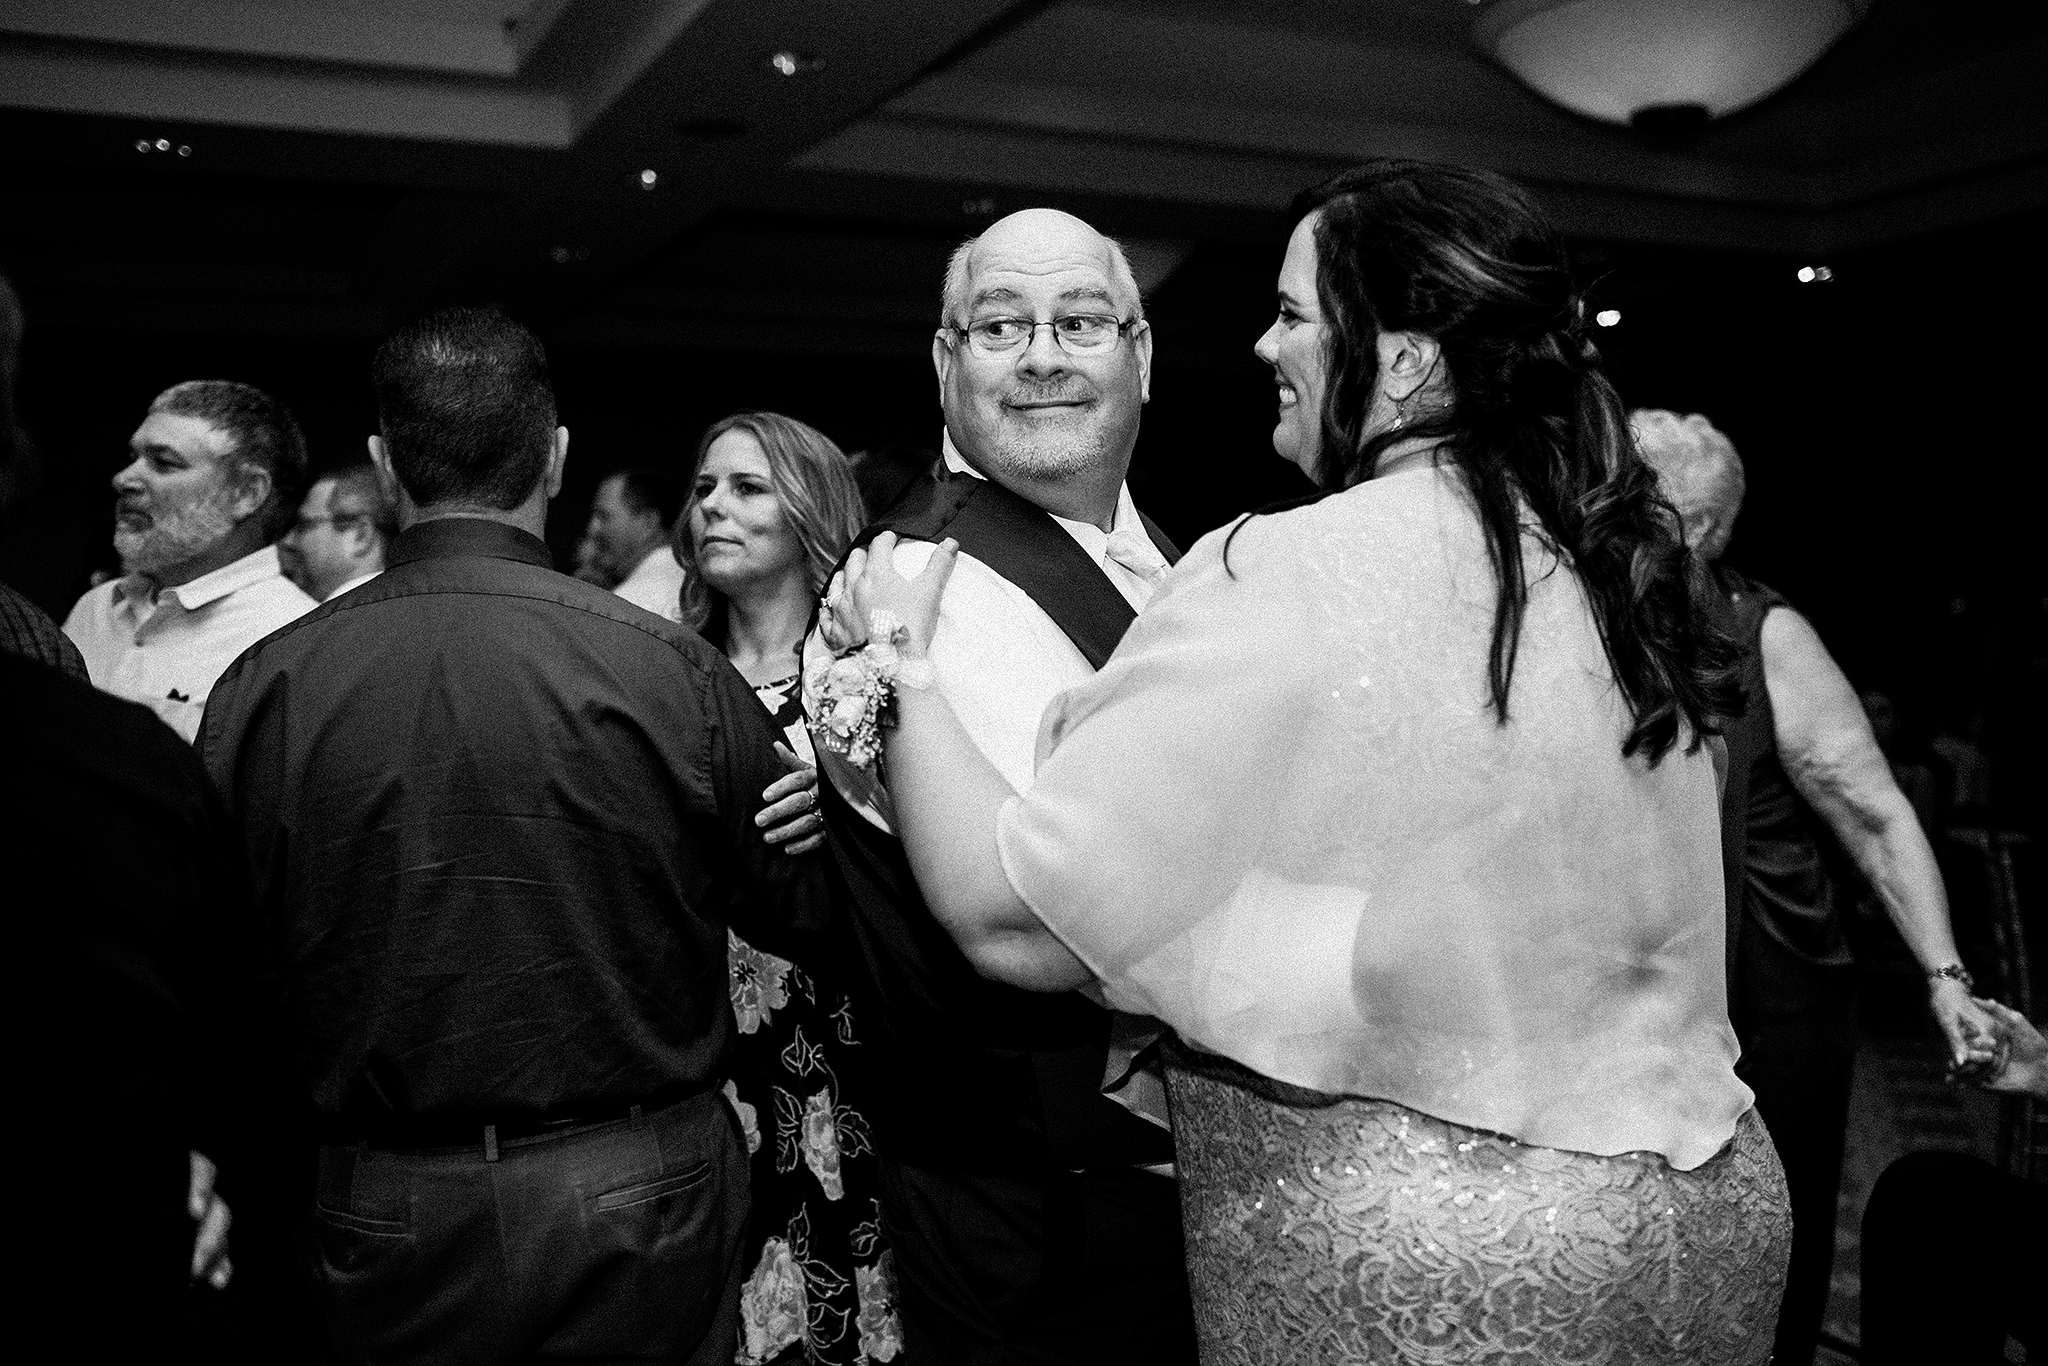 groom's parents dancing at wedding reception | dekalb, il wedding photographer